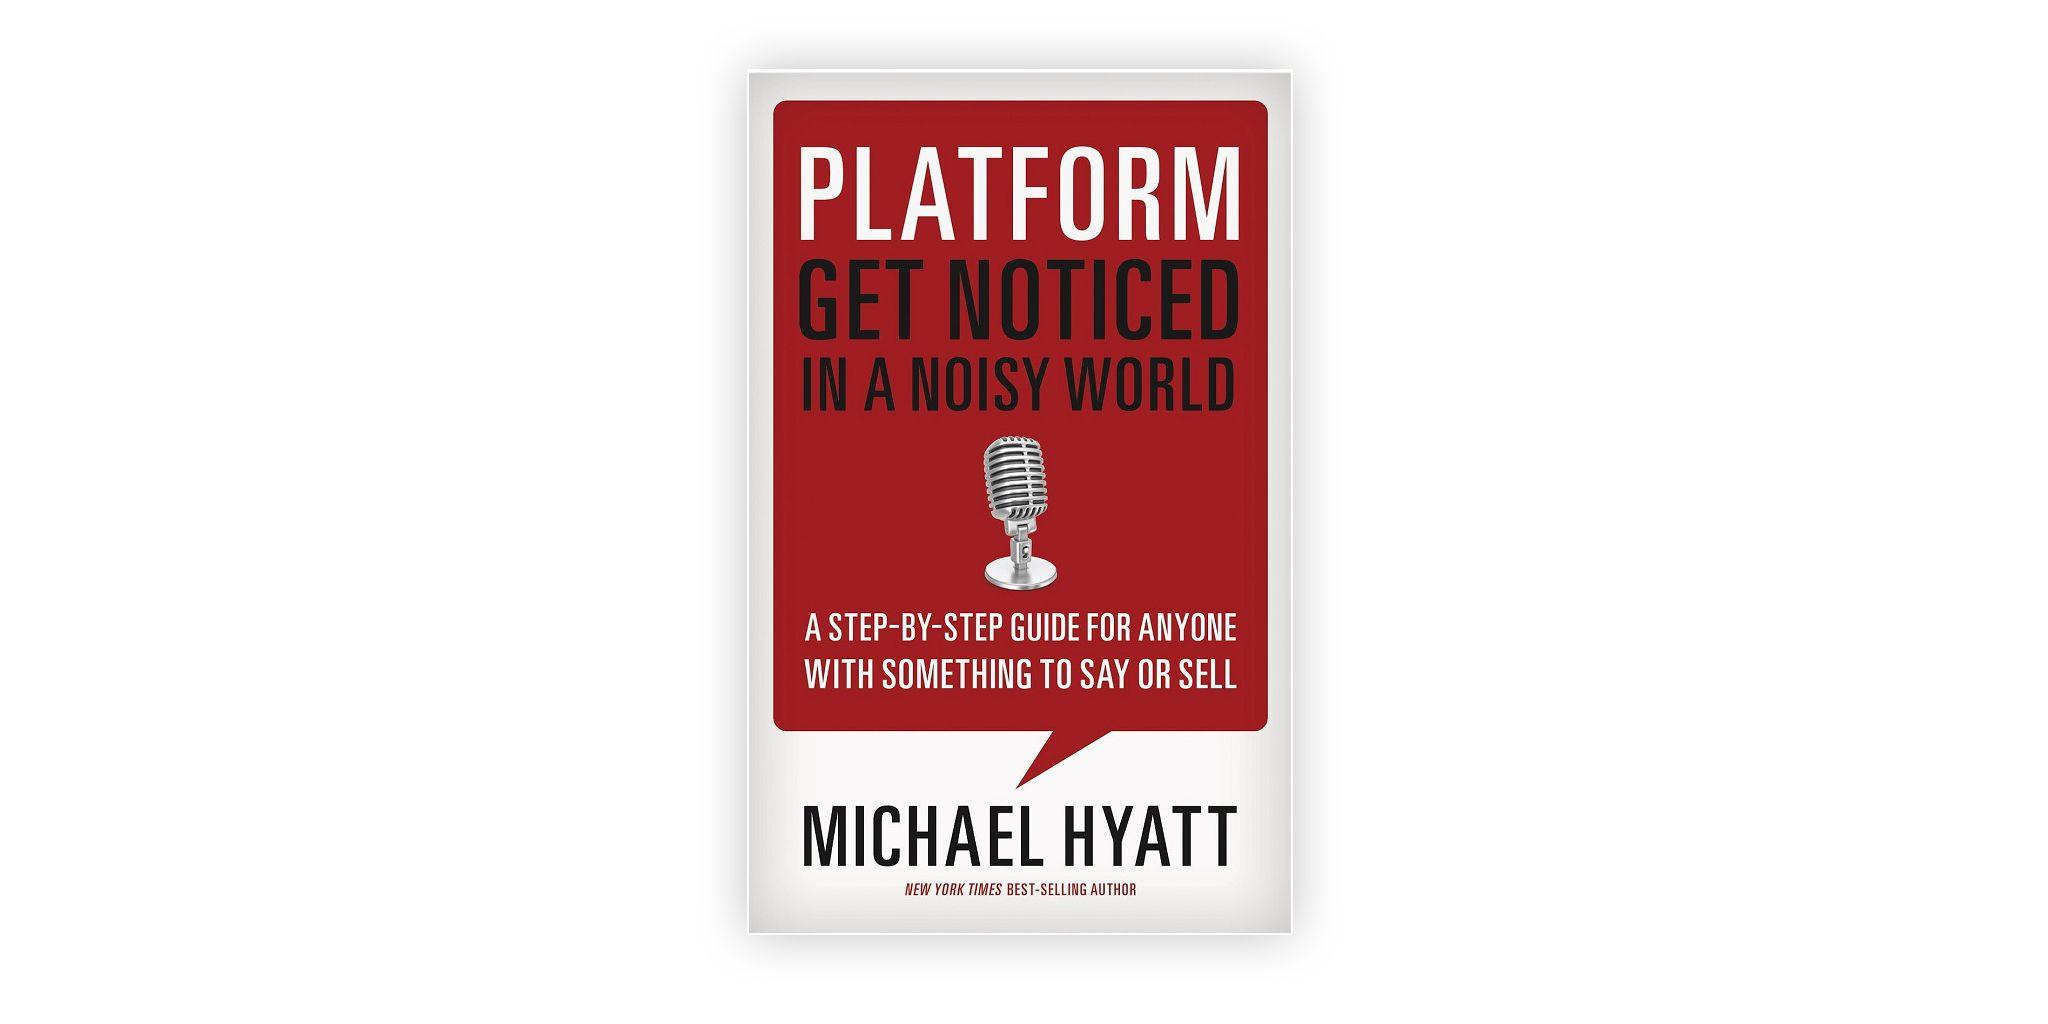 Michael Hyatt Book